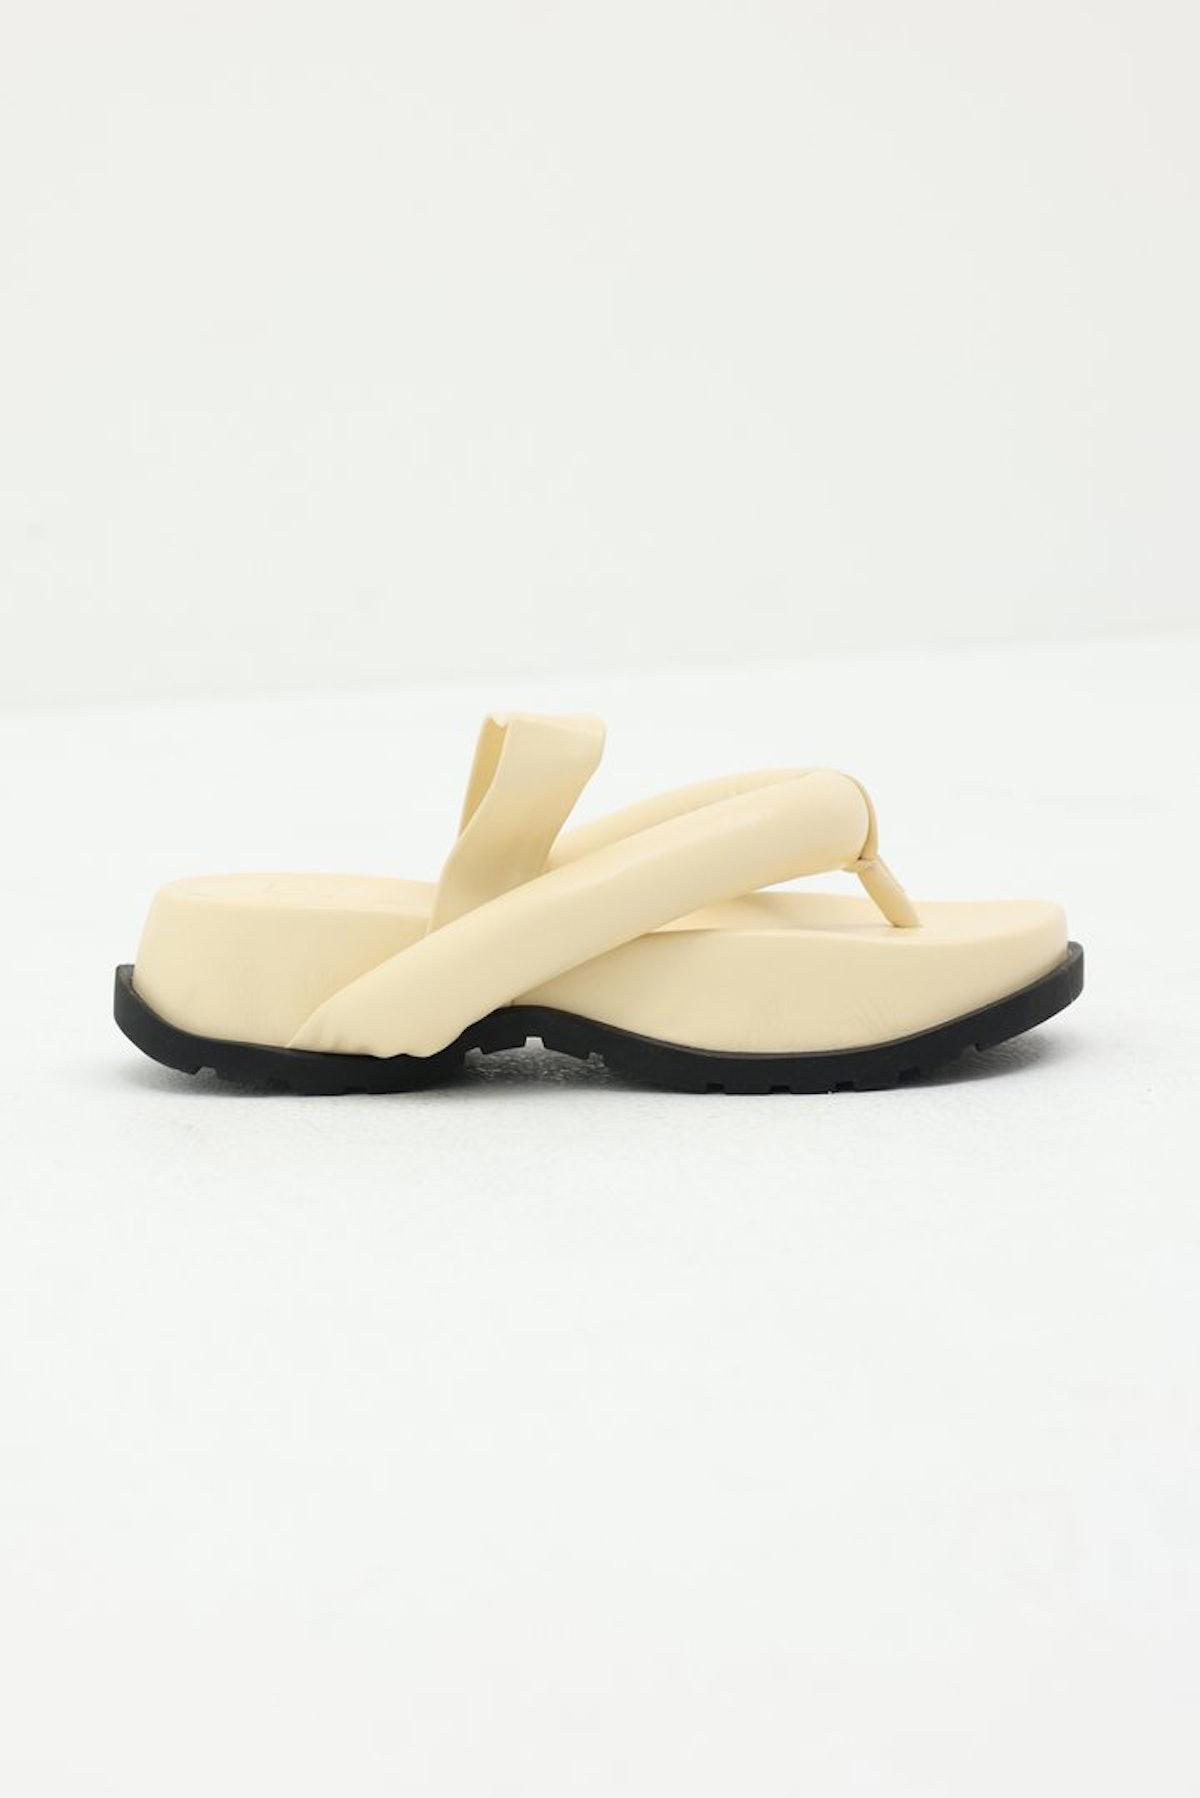 Padded Oversized Thong Sandals in Buttercream